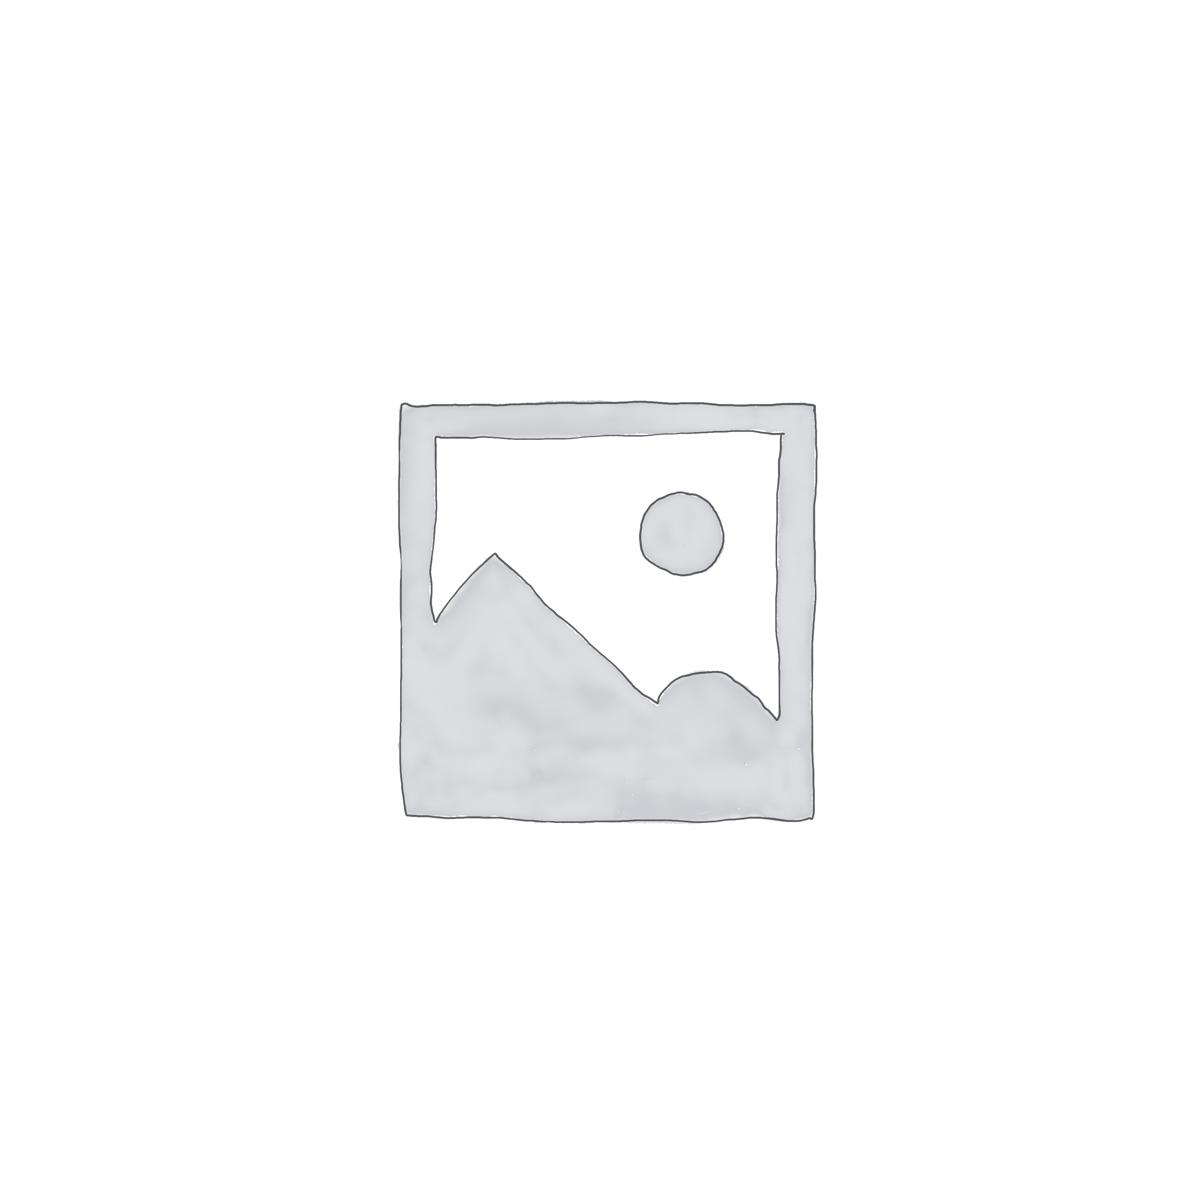 iPhoneケース・スマホケース印刷